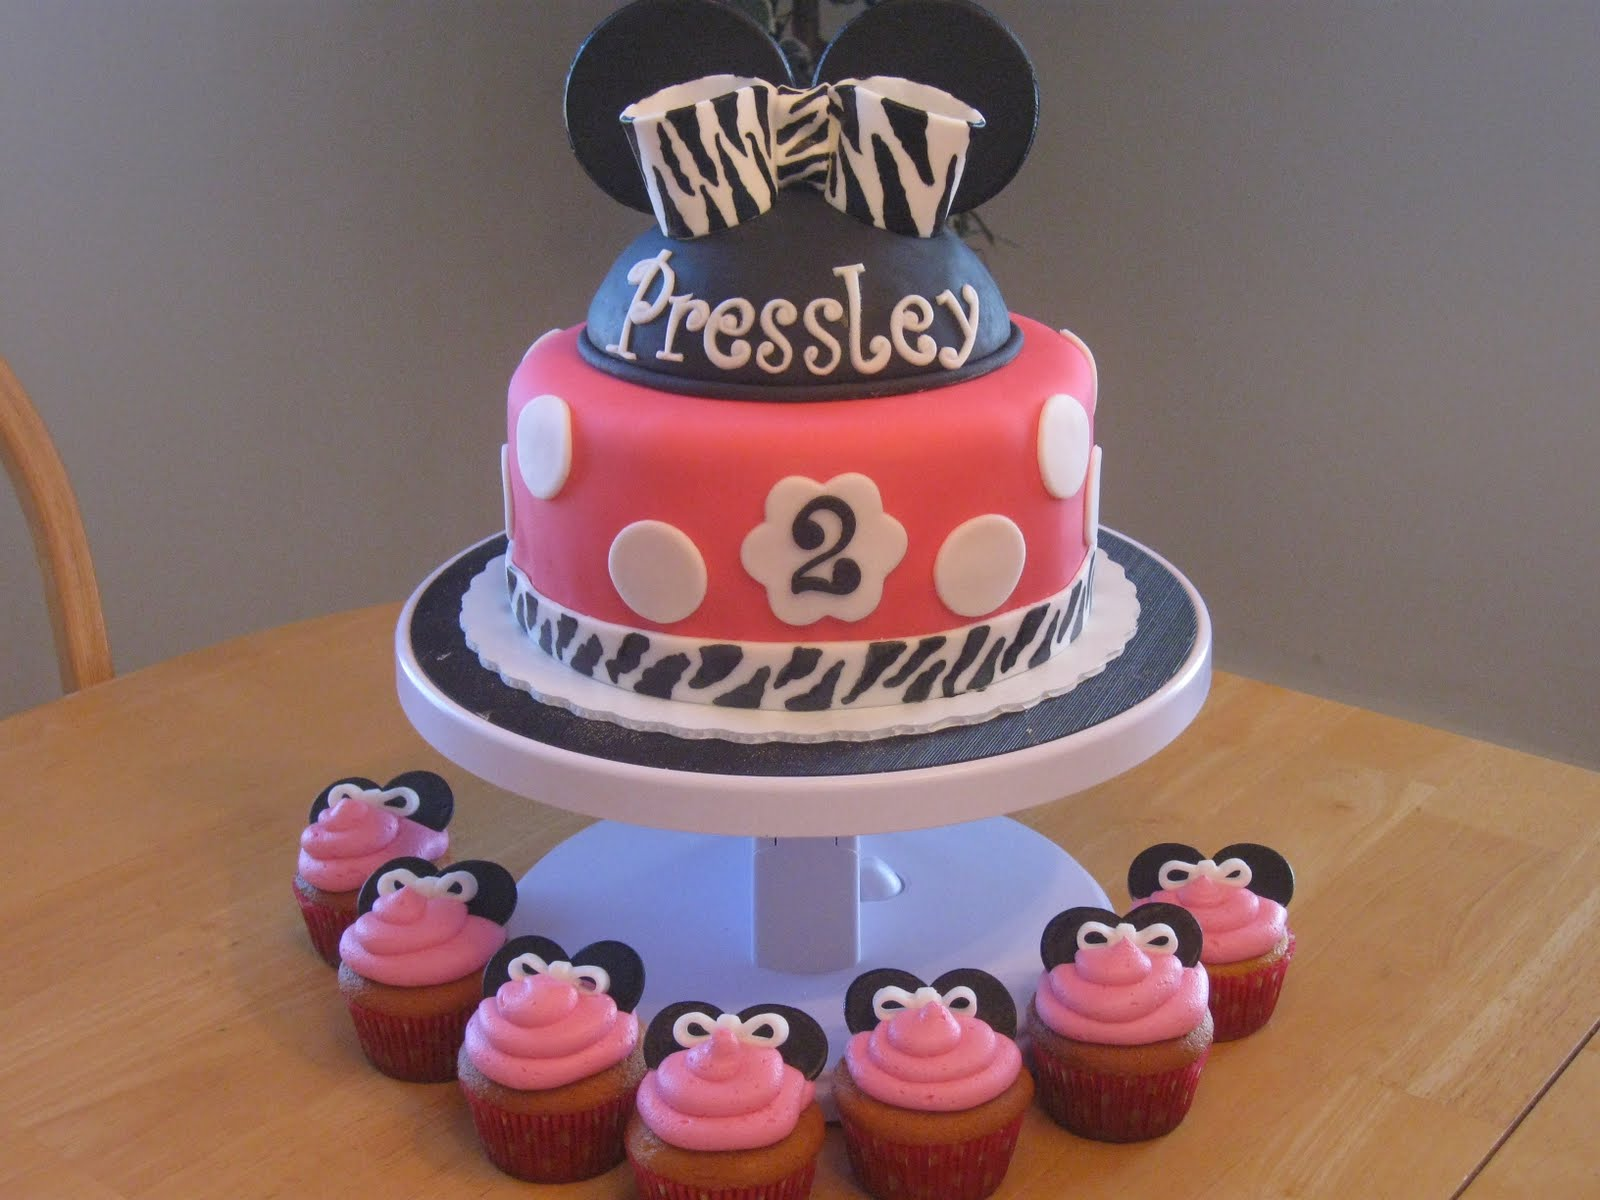 Awesome Cake with Cupcakes Around Itcake with Cupcakes Around It